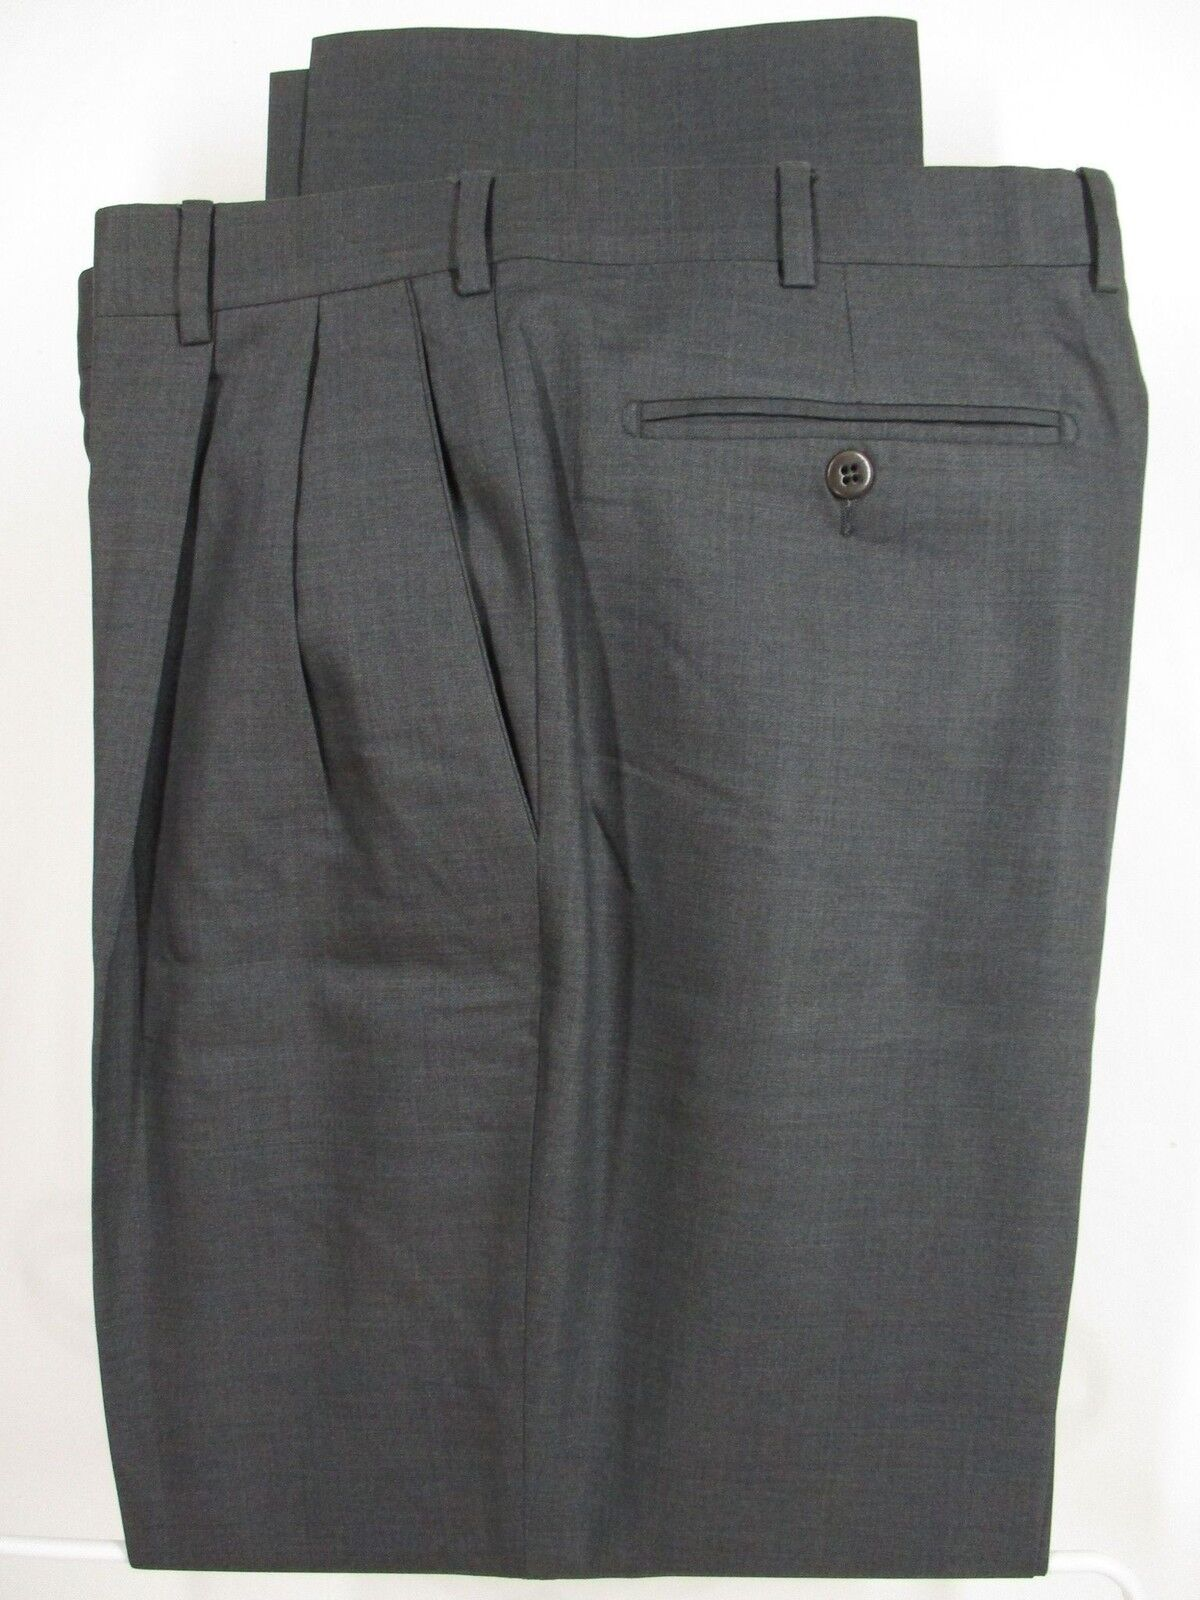 Zanella Bennett Mens Grey Pleated Lgold Piana S130s Dress Size 36 34x29.5